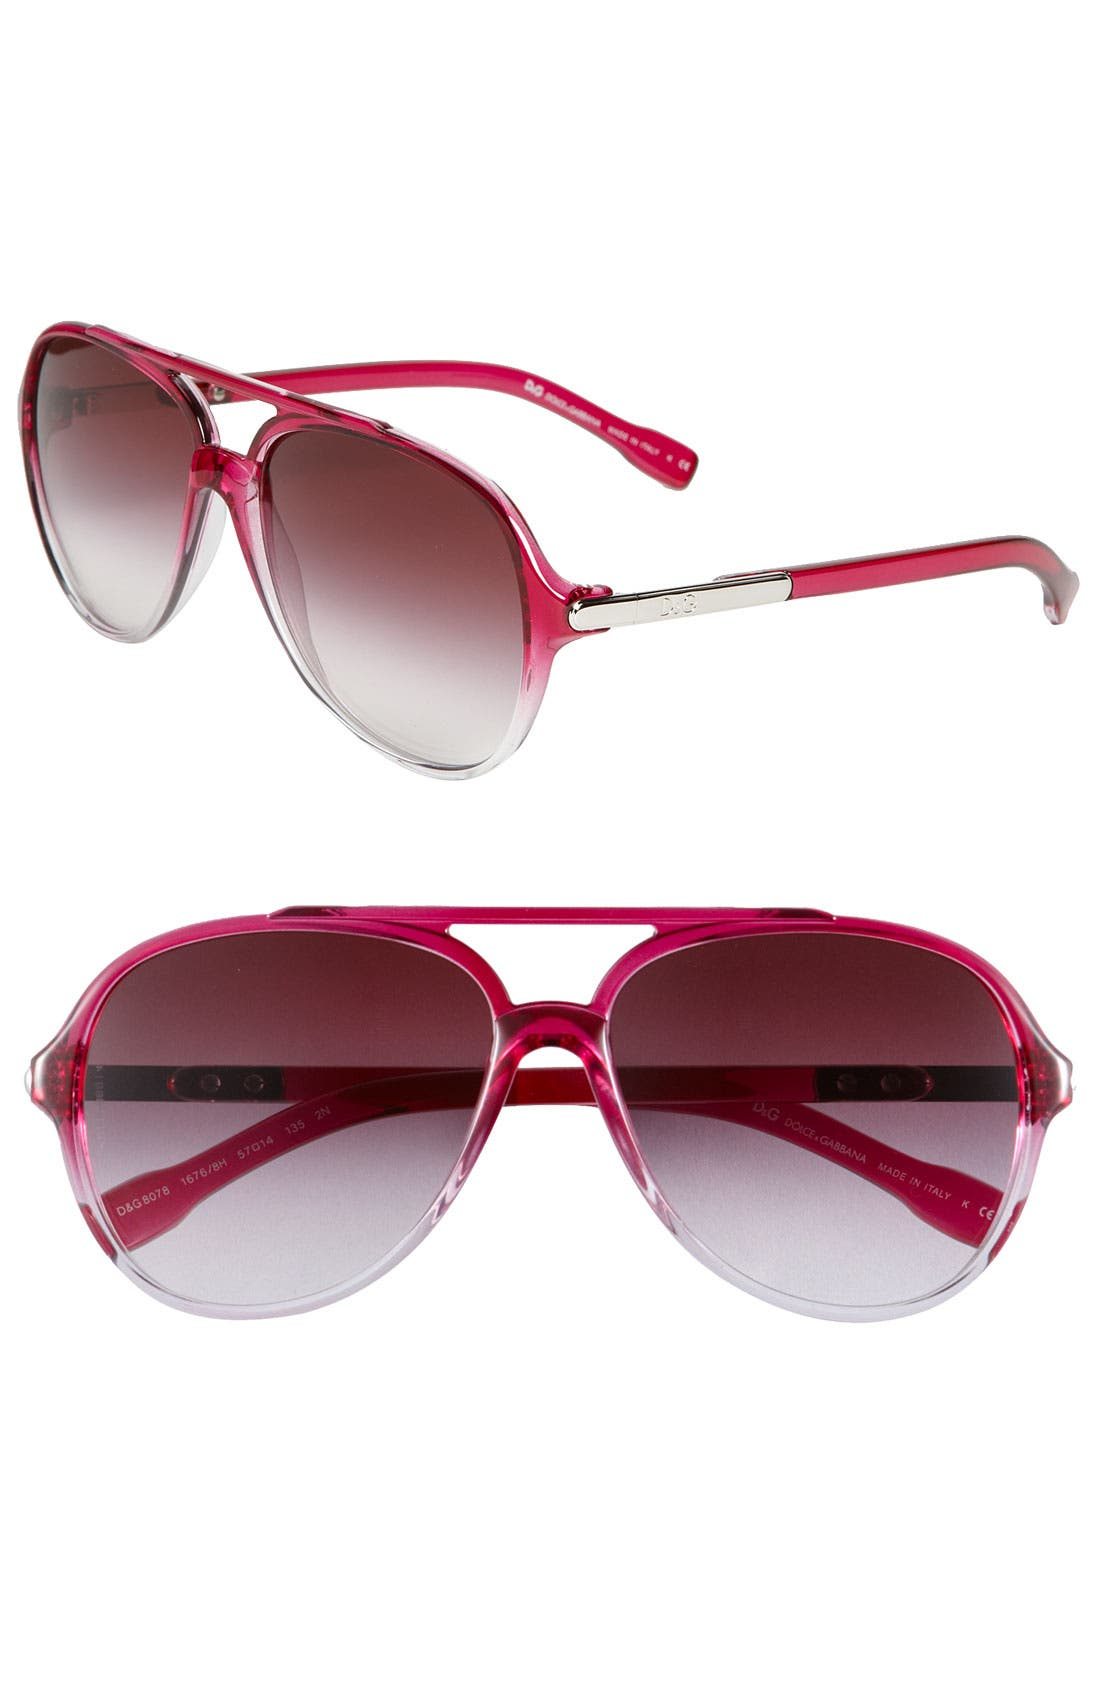 Main Image - D&G 'Trend' Aviator Sunglasses